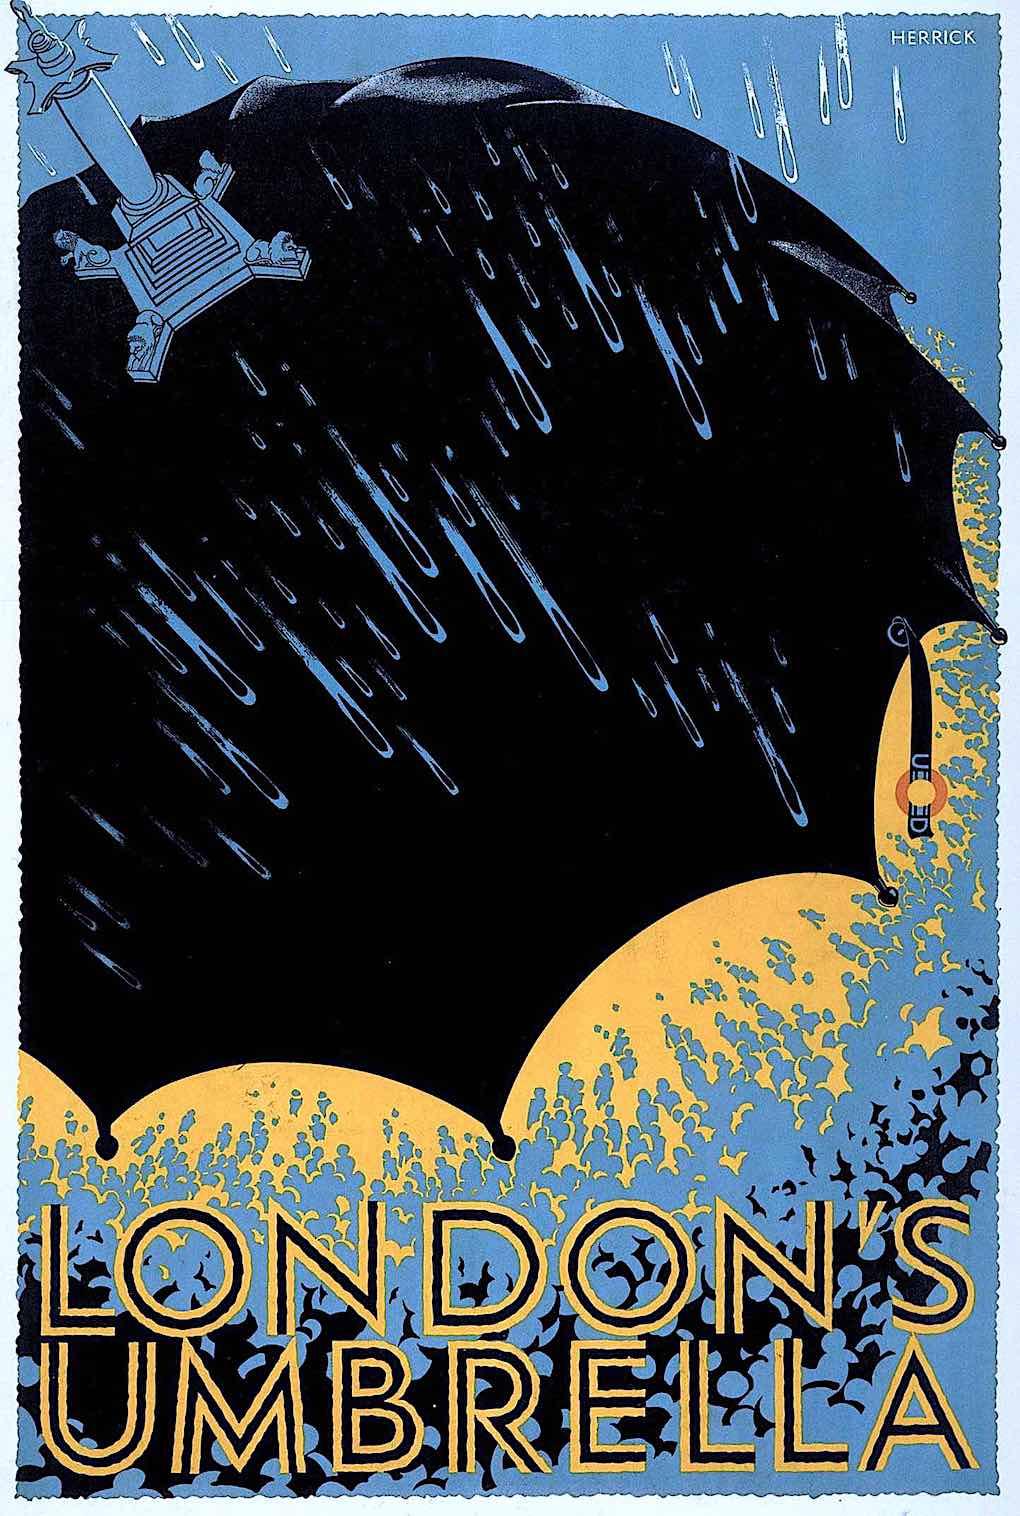 London's Umbrella, a Frederick Herrick 1925 poster for the undergound transit